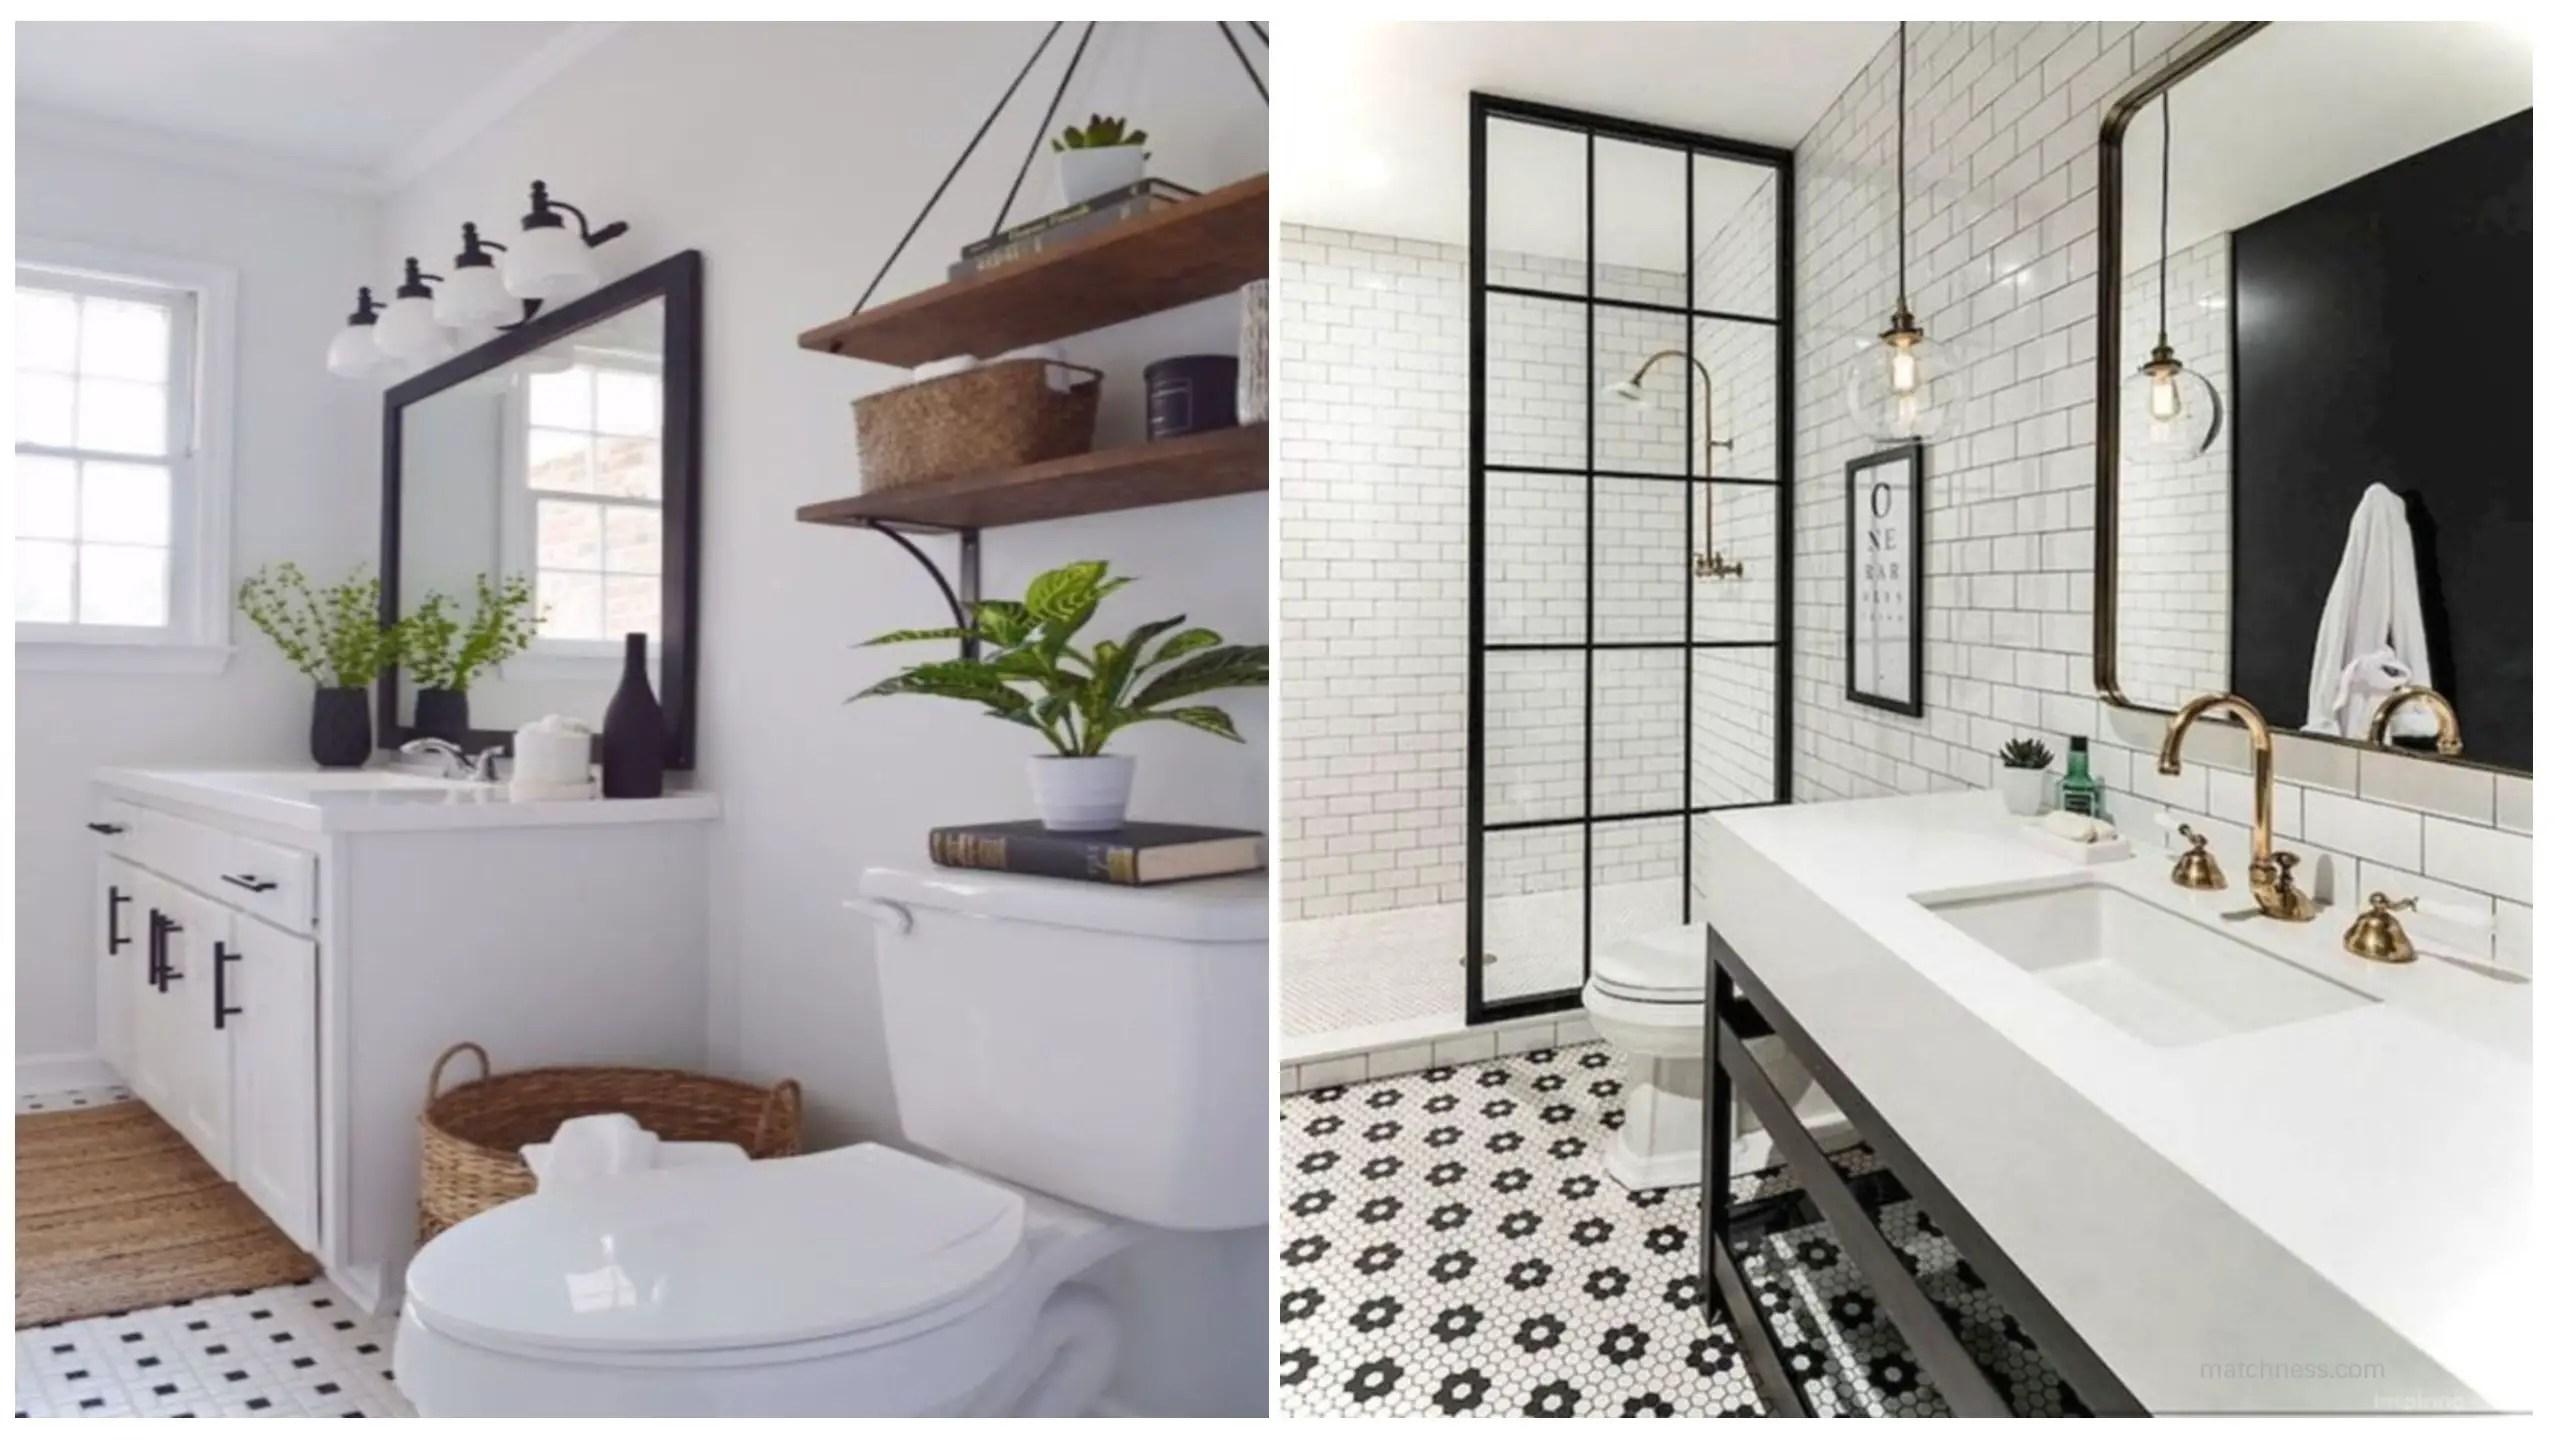 bathroom remodel ideas modern. Beautiful And Modern Farmhouse Bathroom Design Ideas Remodel R